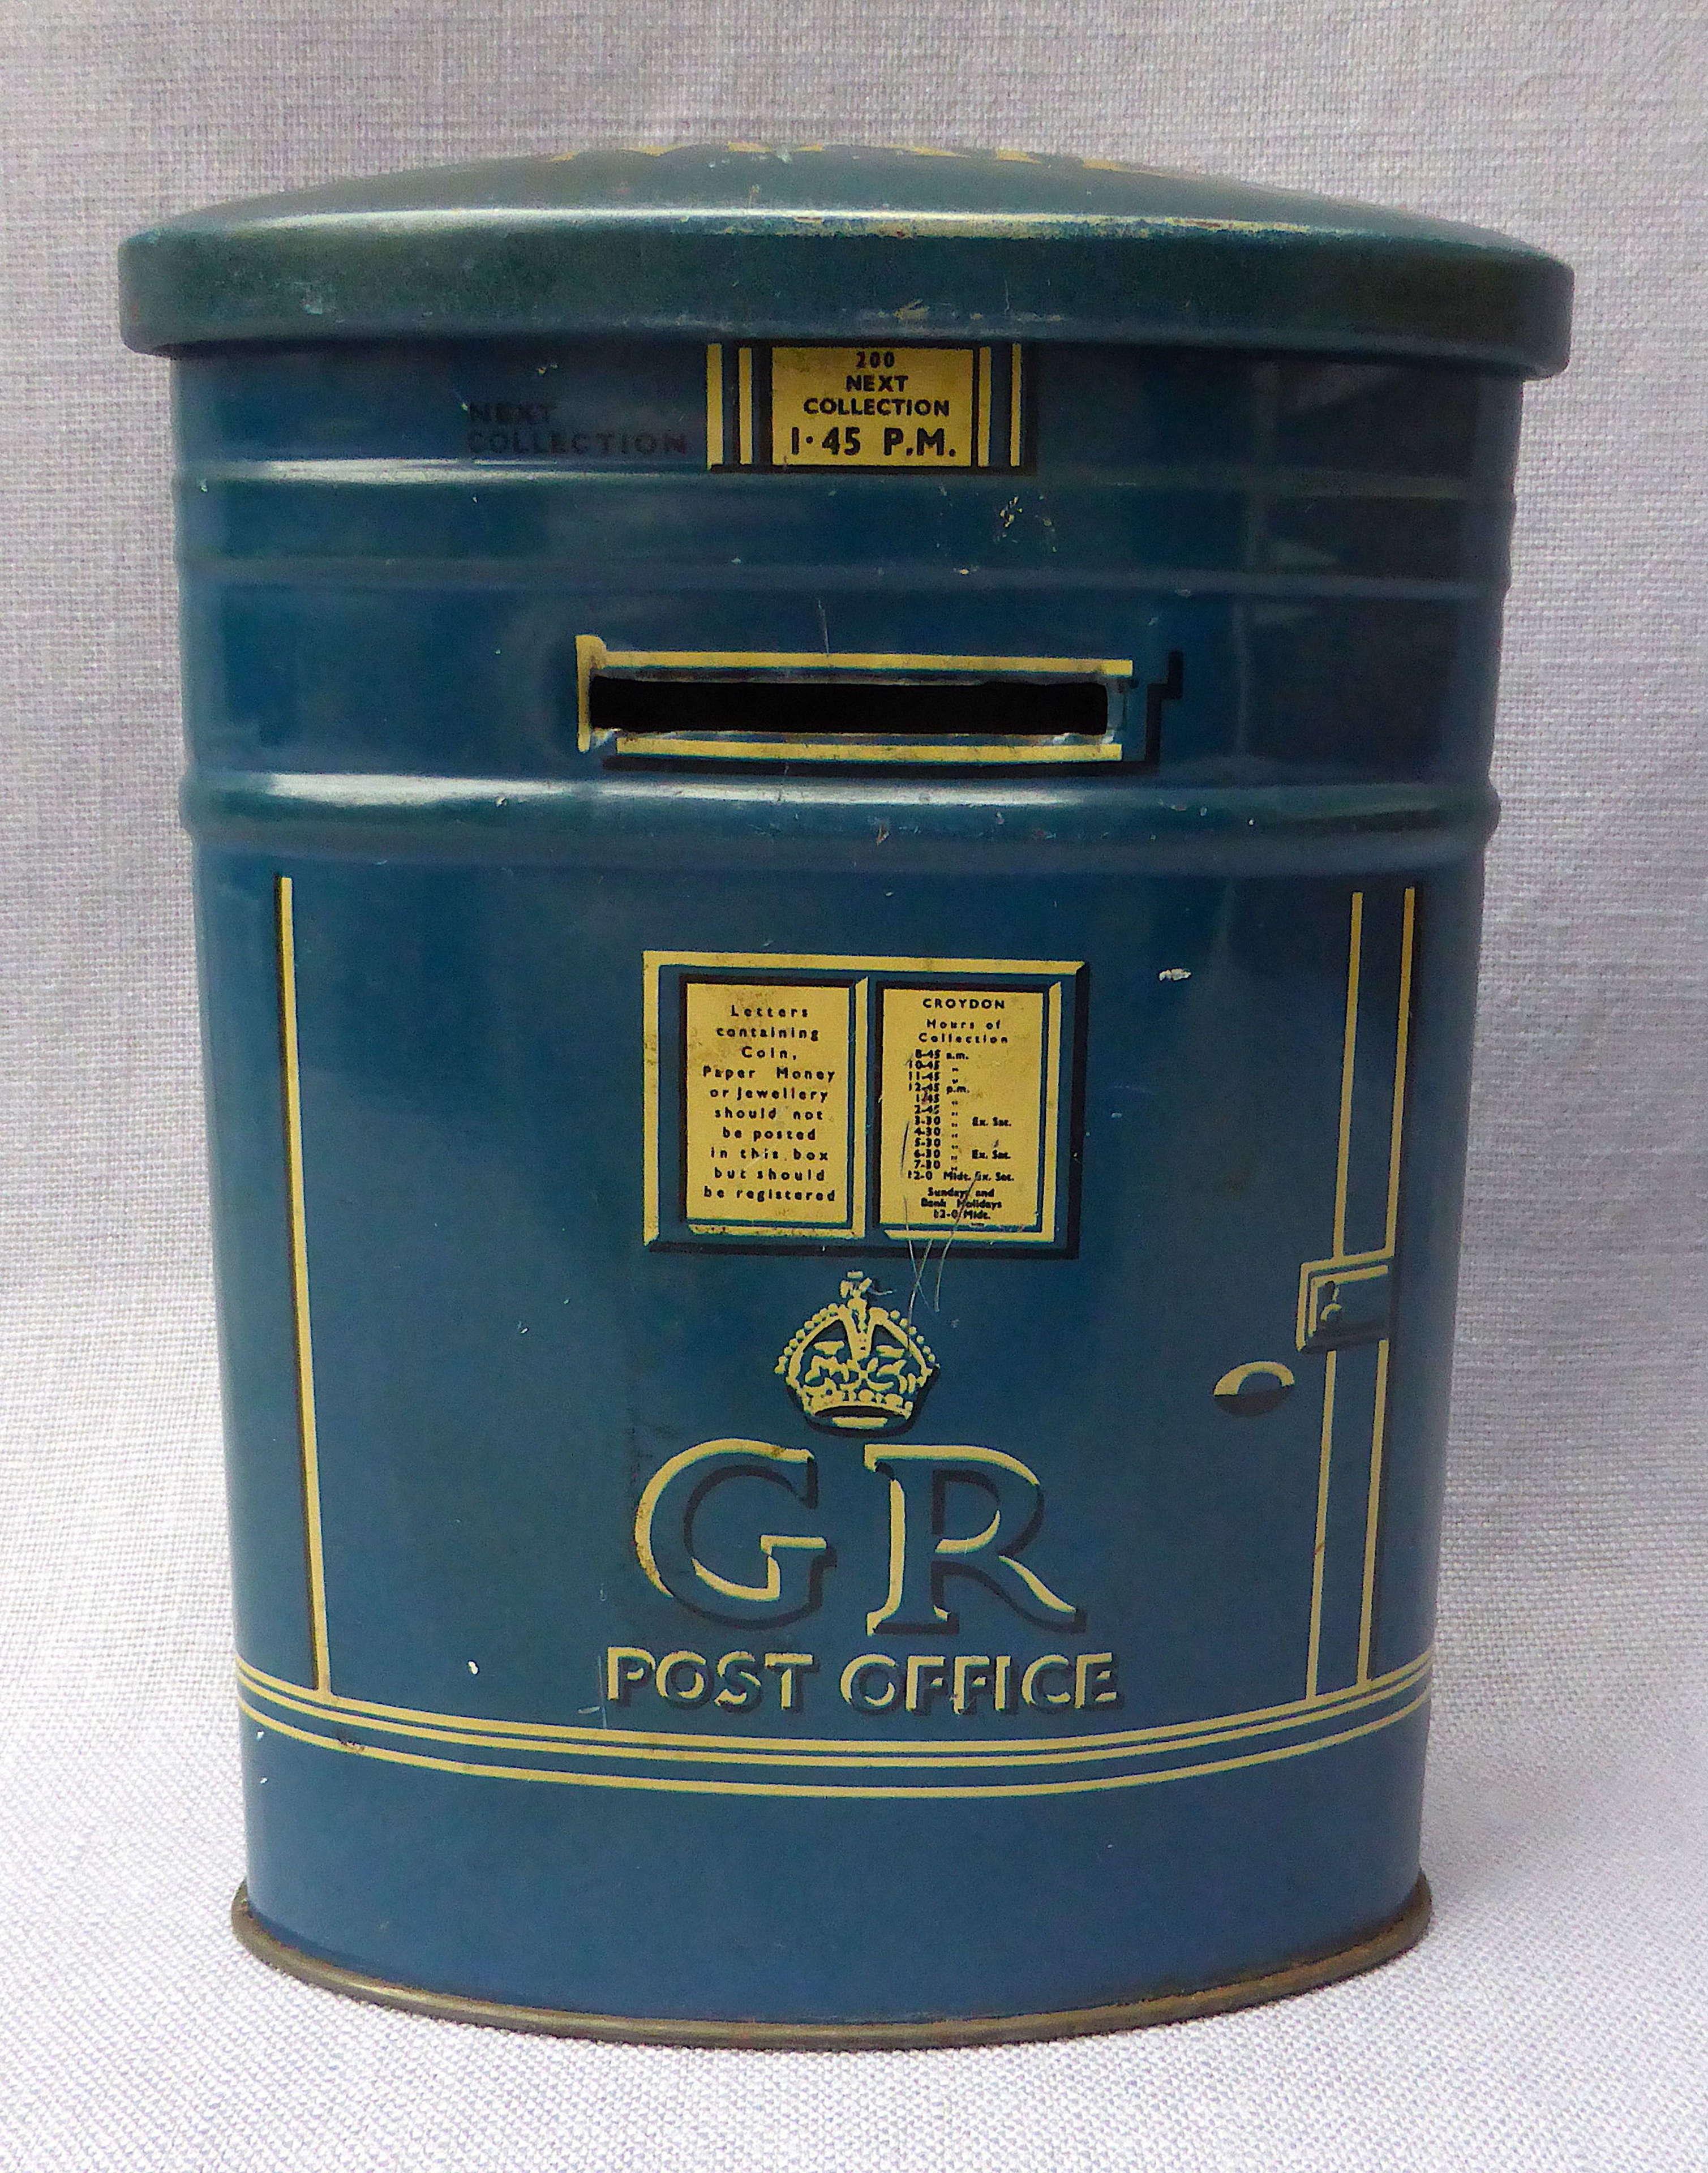 Rare 1930s blue airmail postbox money box